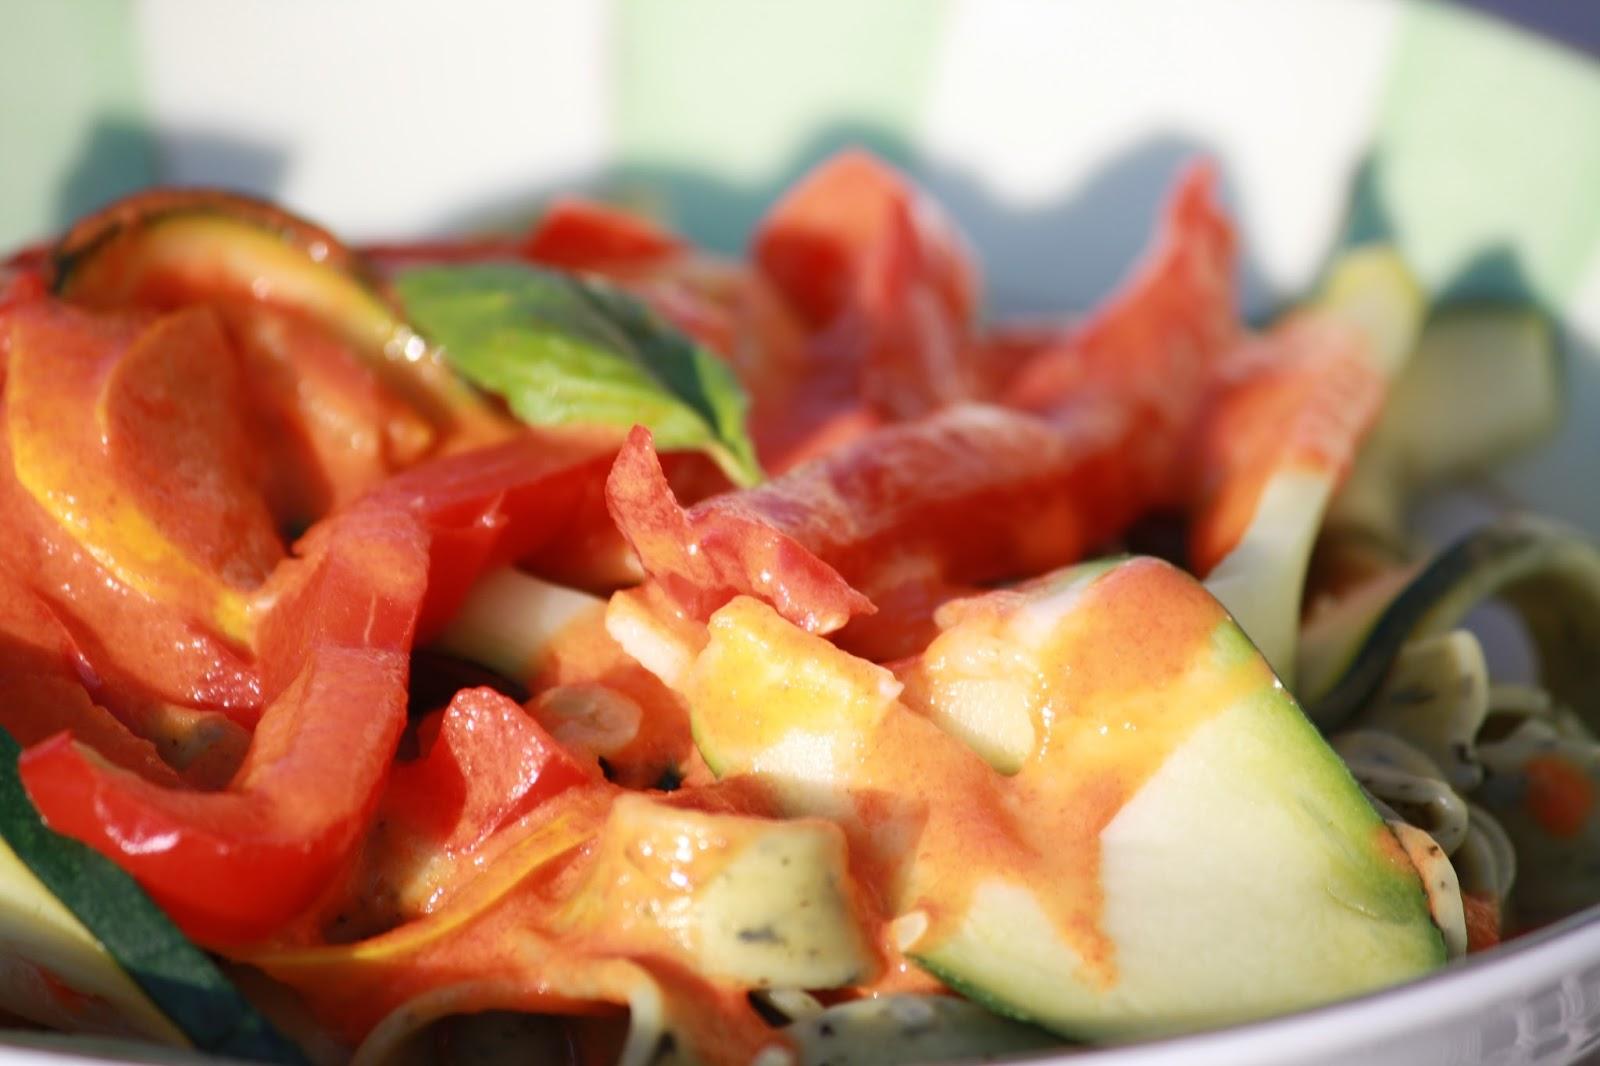 Saveur naturel atelier de cuisine saine et gourmande - Cuisine saine et gourmande ...